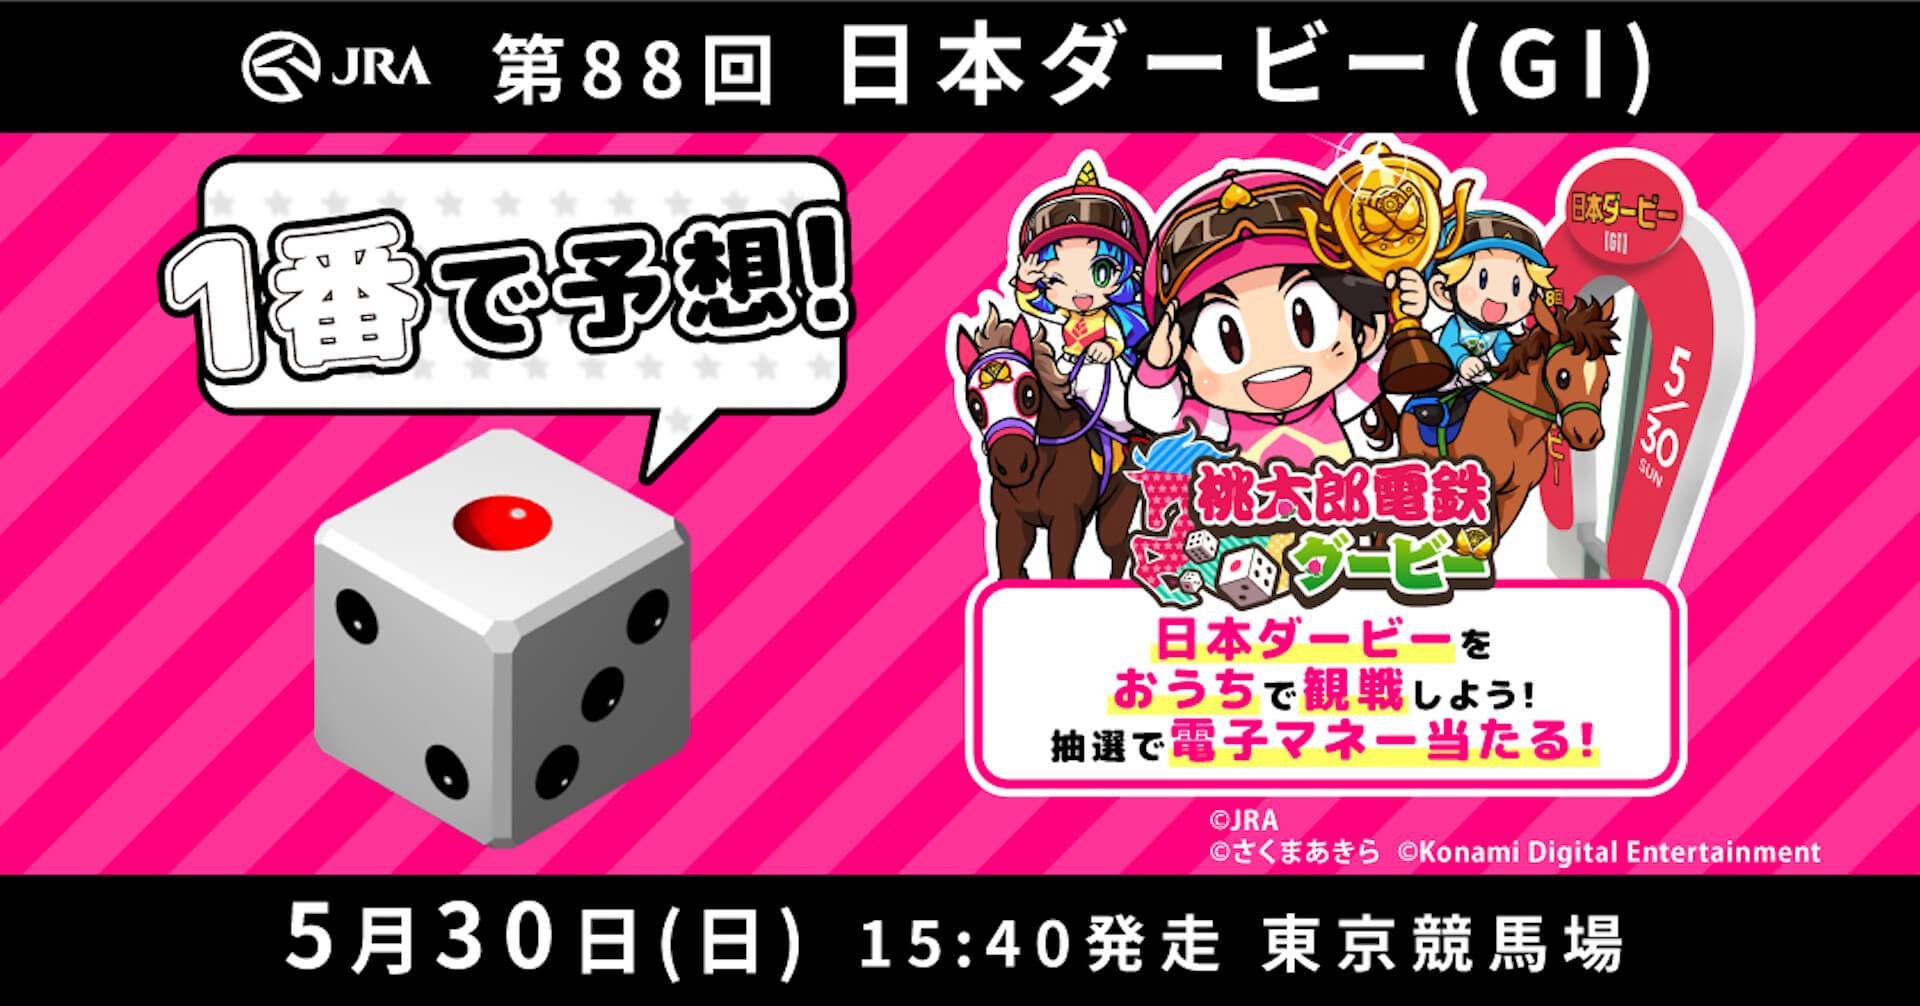 JRAと桃太郎電鉄が日本ダービーでコラボ!1万円分の電子マネーギフトが当たるTwitterキャンペーンも実施 tech210517_jra-momotetsu-210517_8